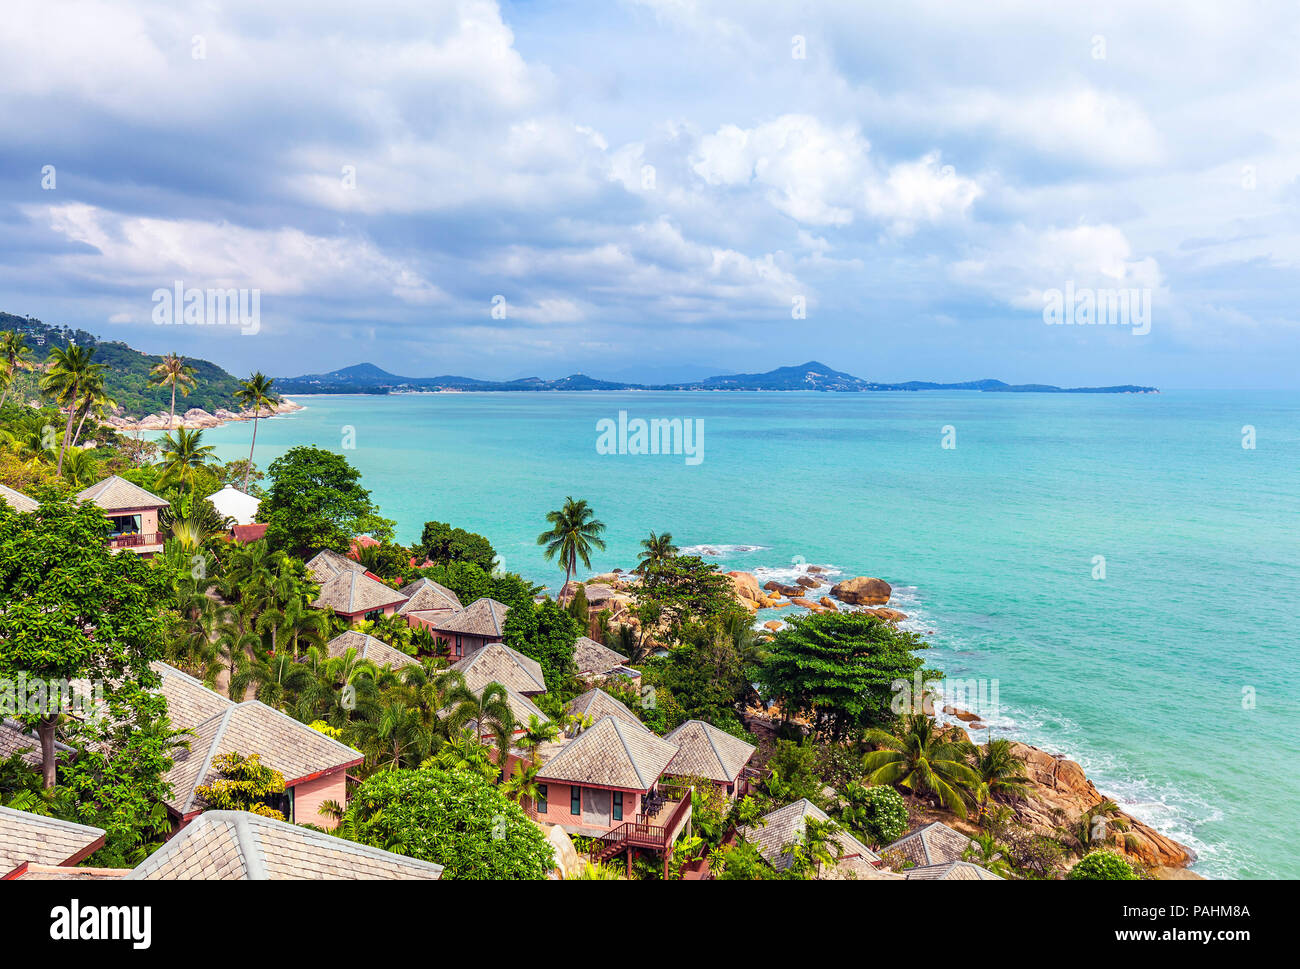 Beautiful views of the coast of Koh Samui in Thailand. Stock Photo